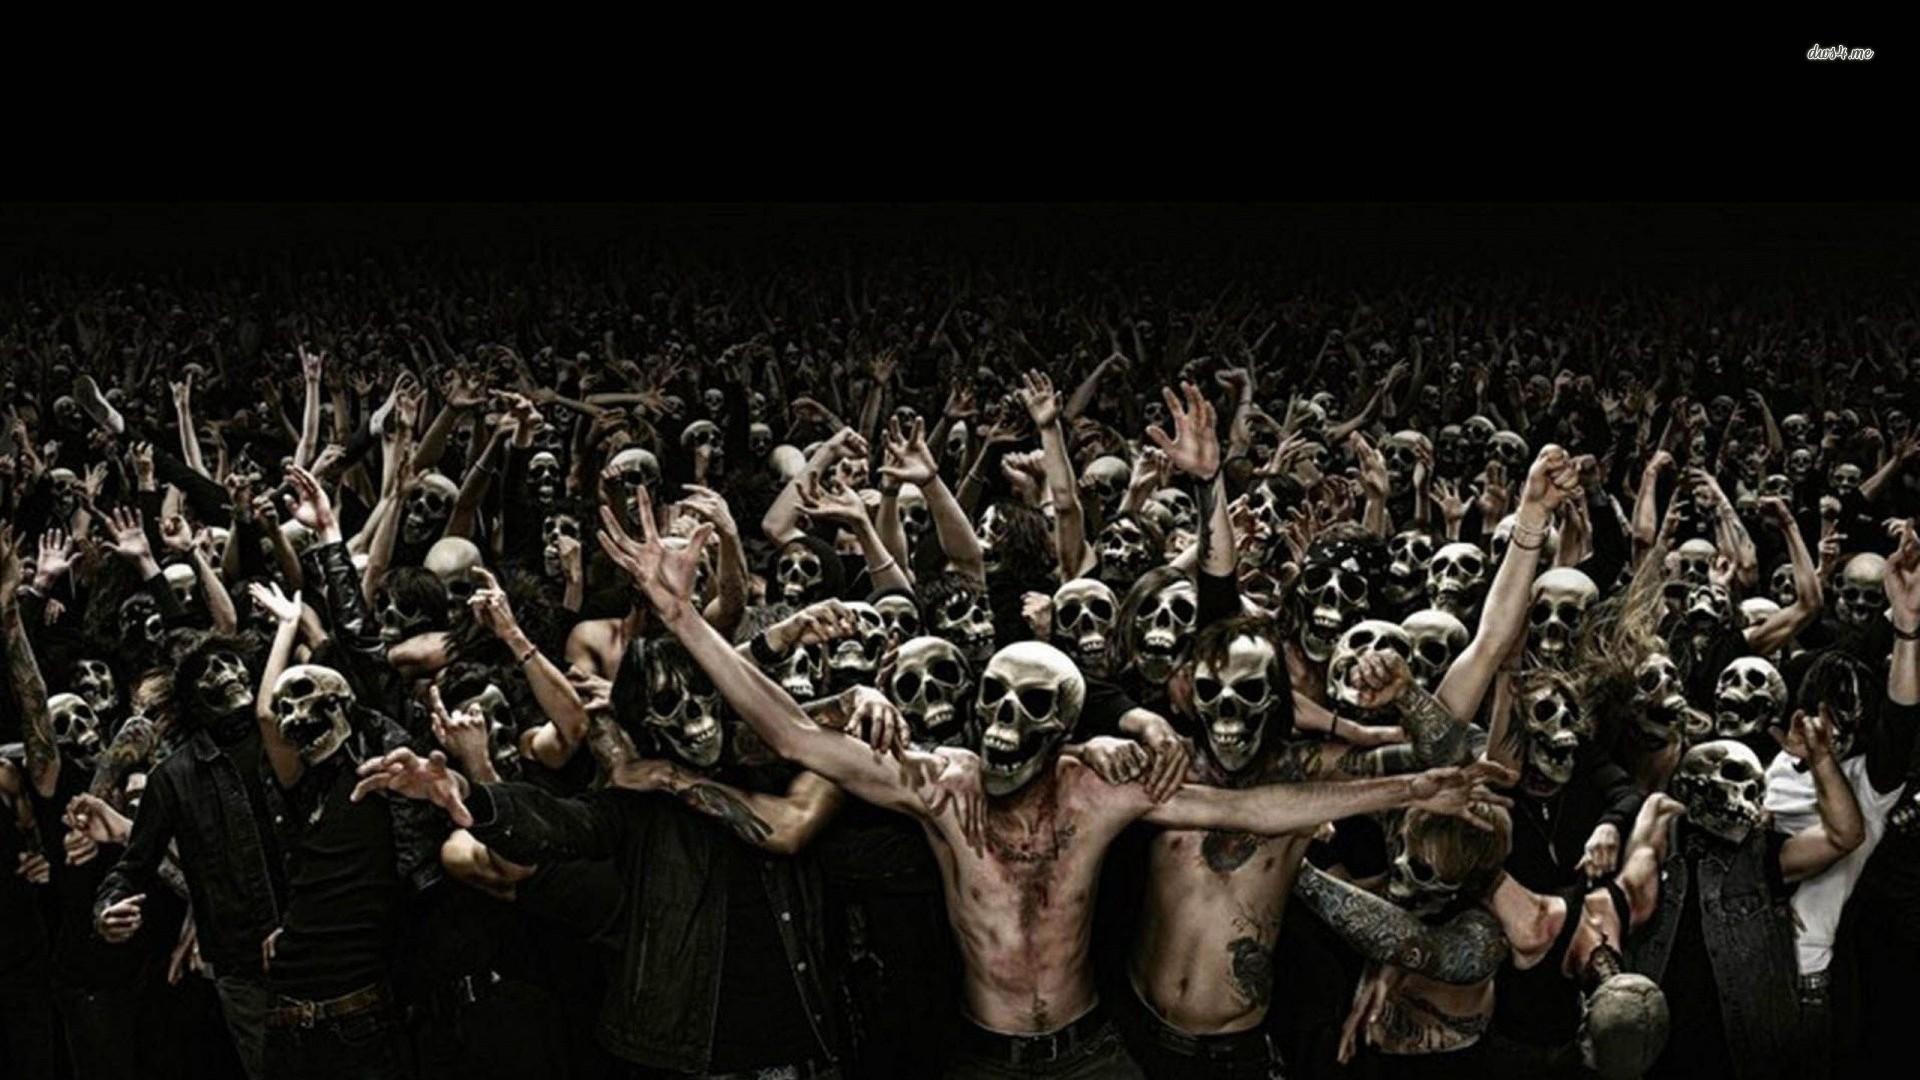 Zombie attack wallpaper – Digital Art wallpapers – #12309